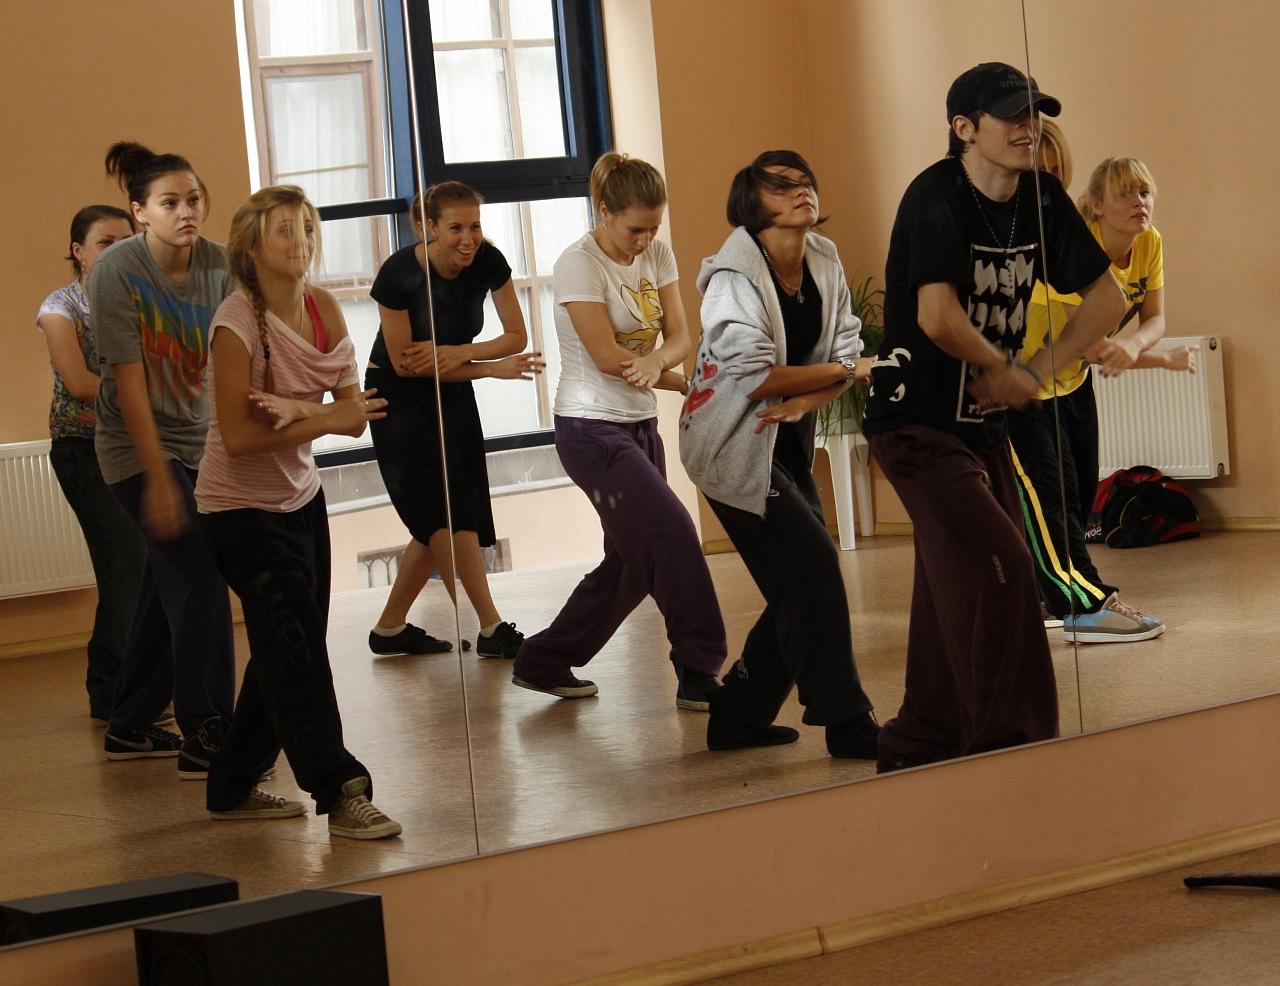 Танцы, танцы СПб, танец, танец СПб, танцы для взрослых, танцы для детей, танцы для мужчин, танцы для женщин